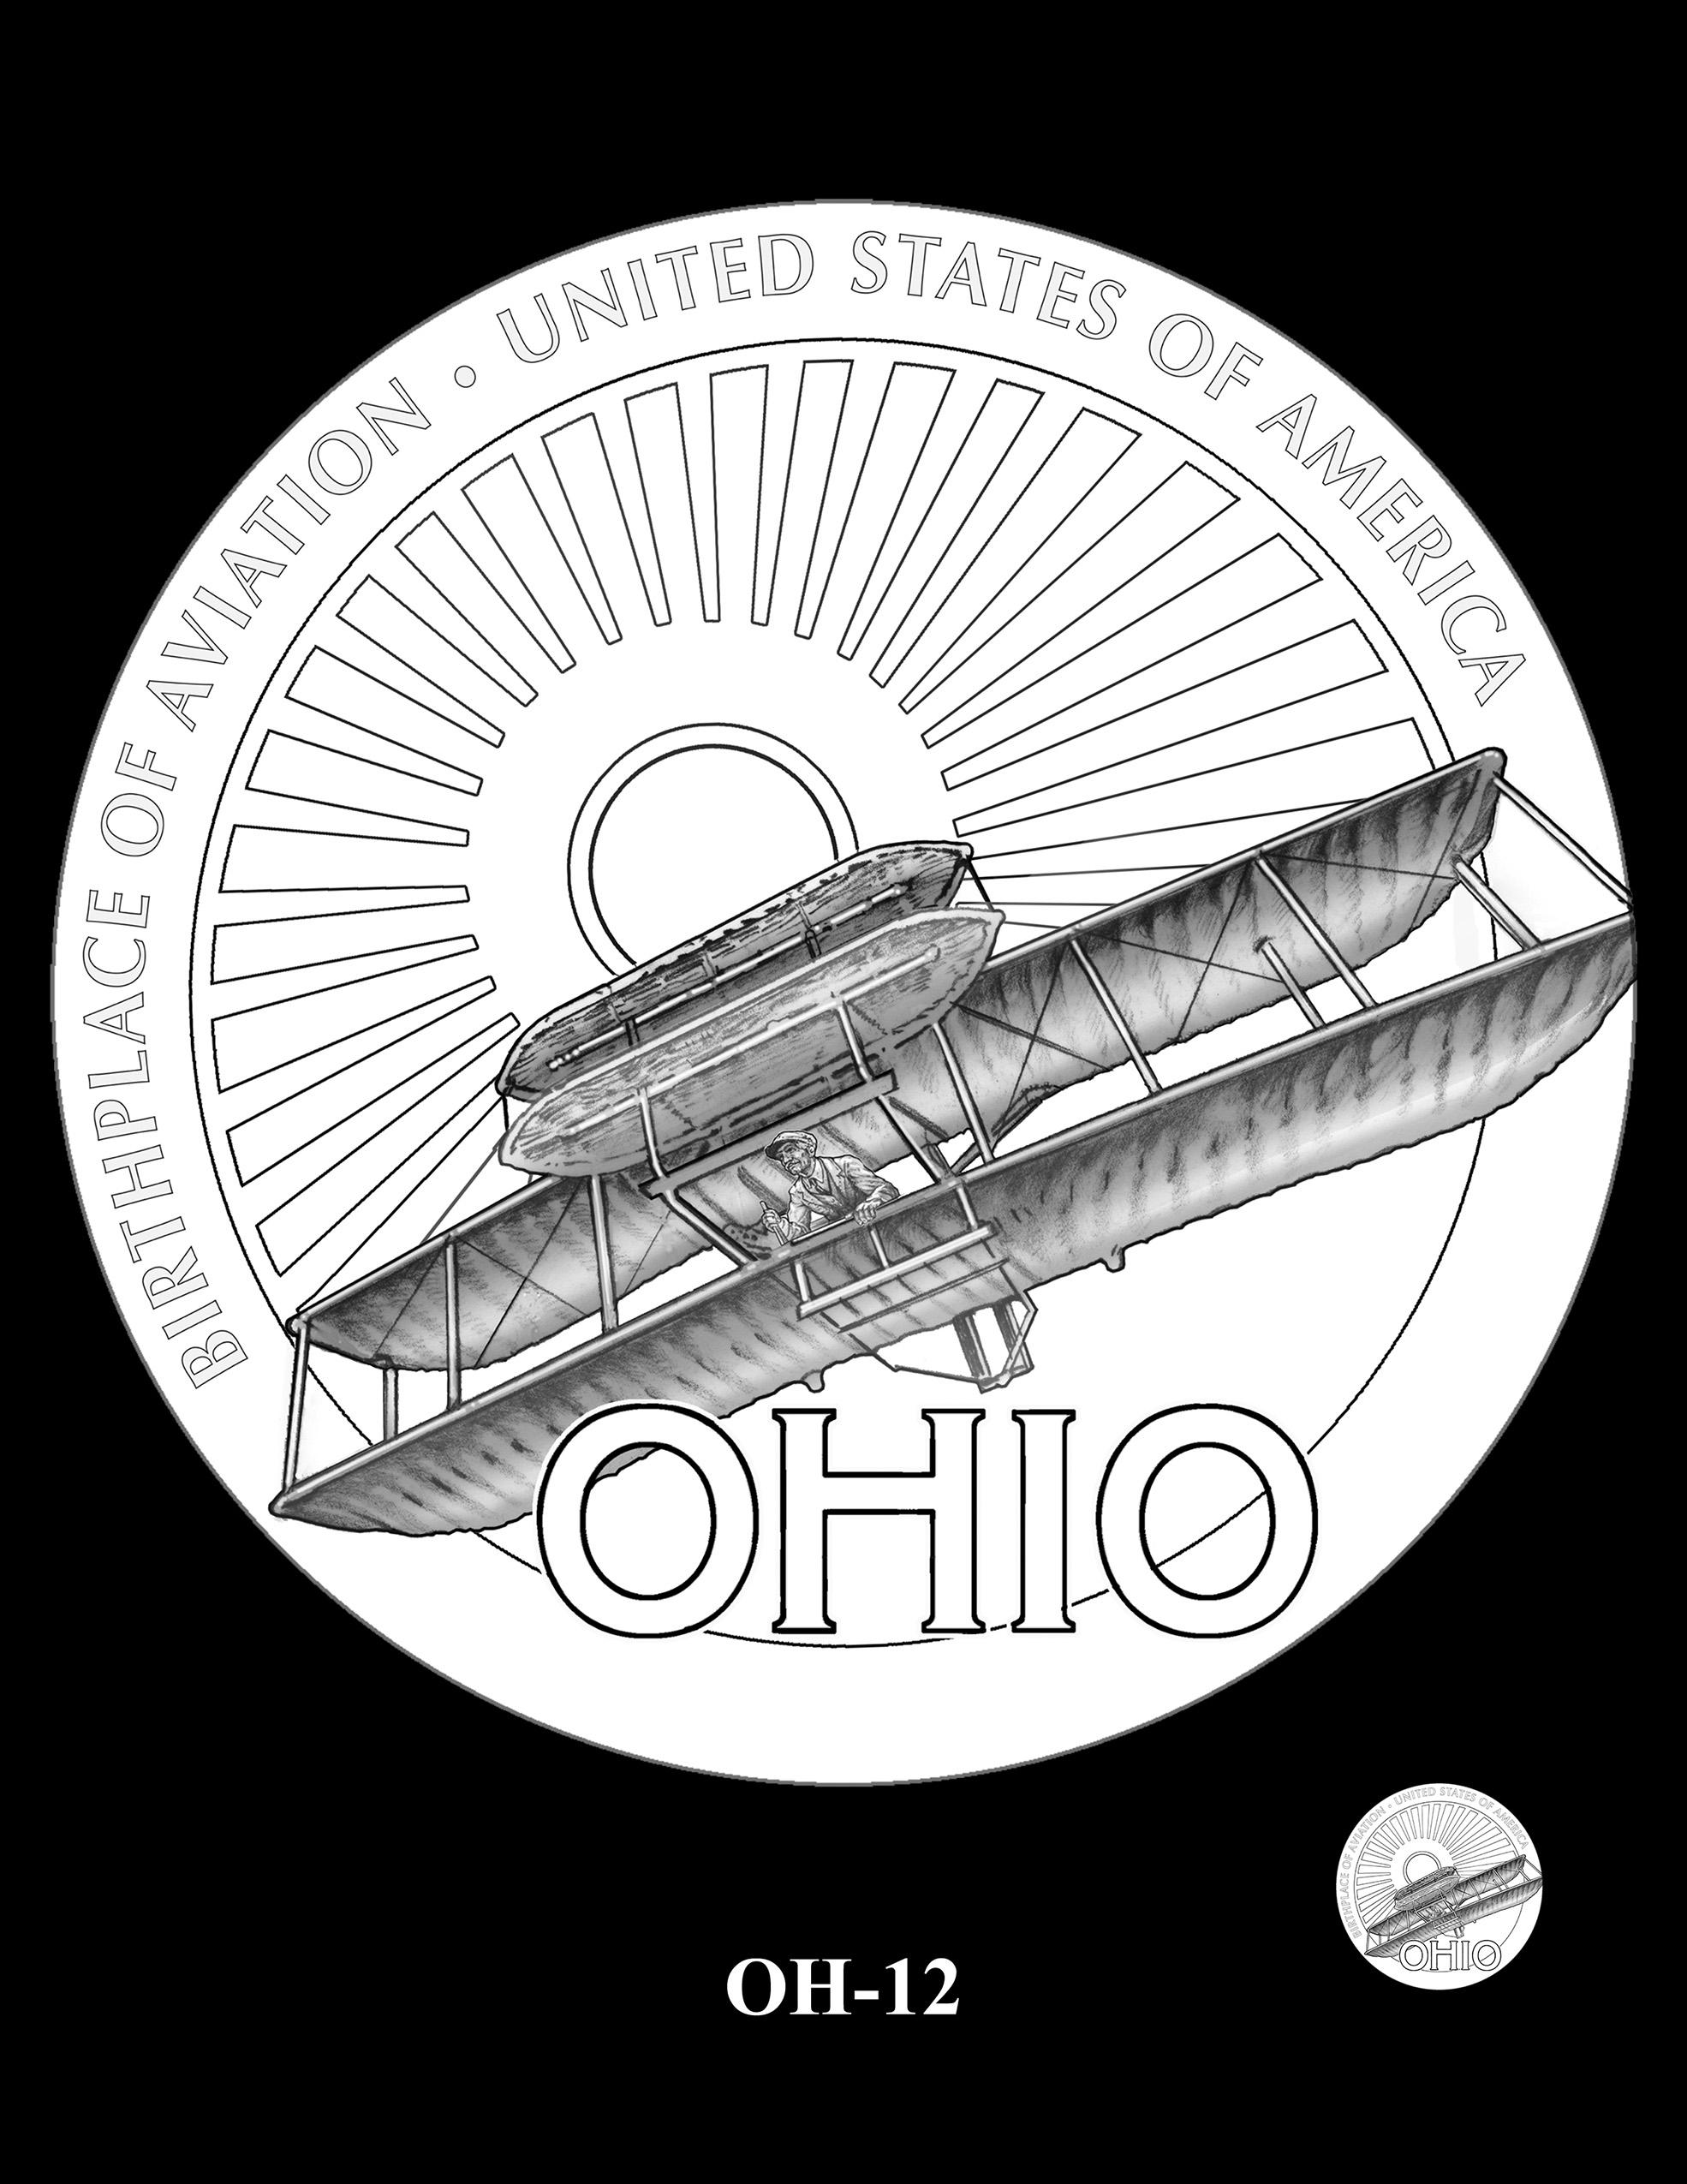 OH-12 -- 2023 American Innovation $1 Coin Program - Ohio